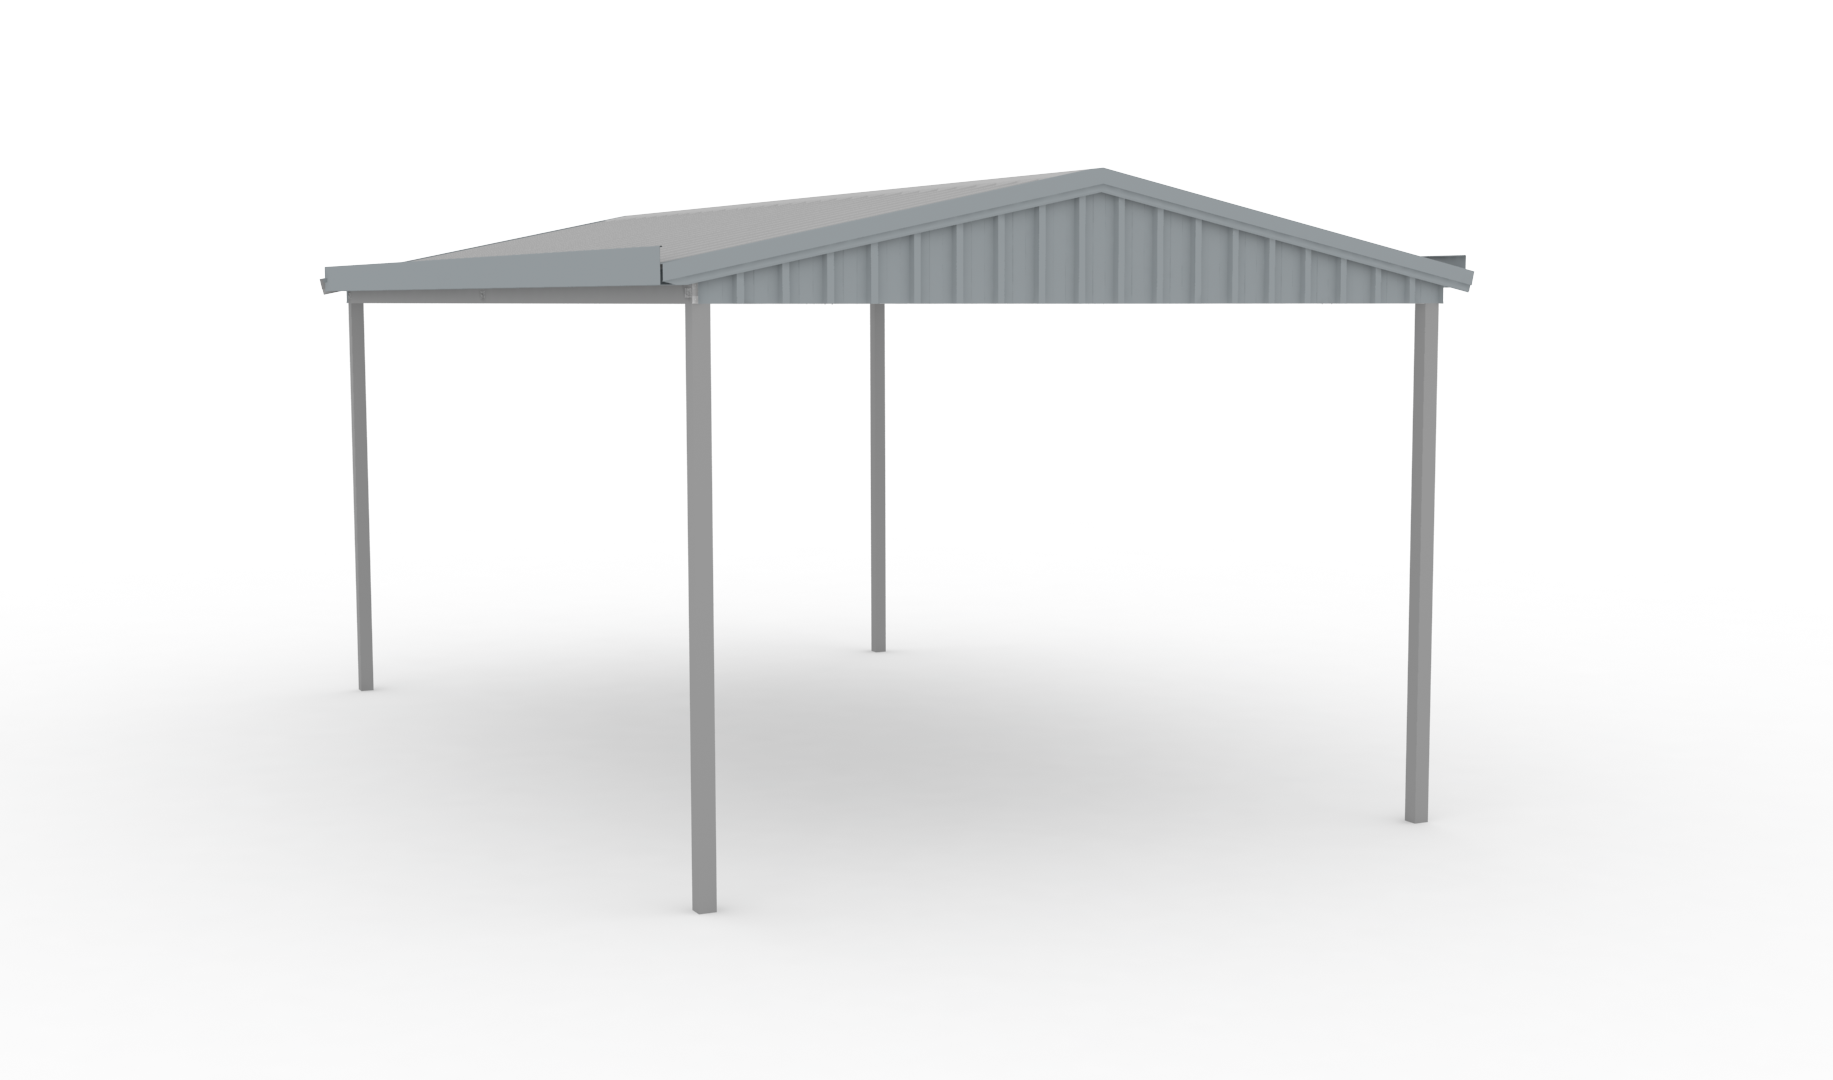 3 6x6x2 4 Gable Carport Mecano Sheds And Kit Homes